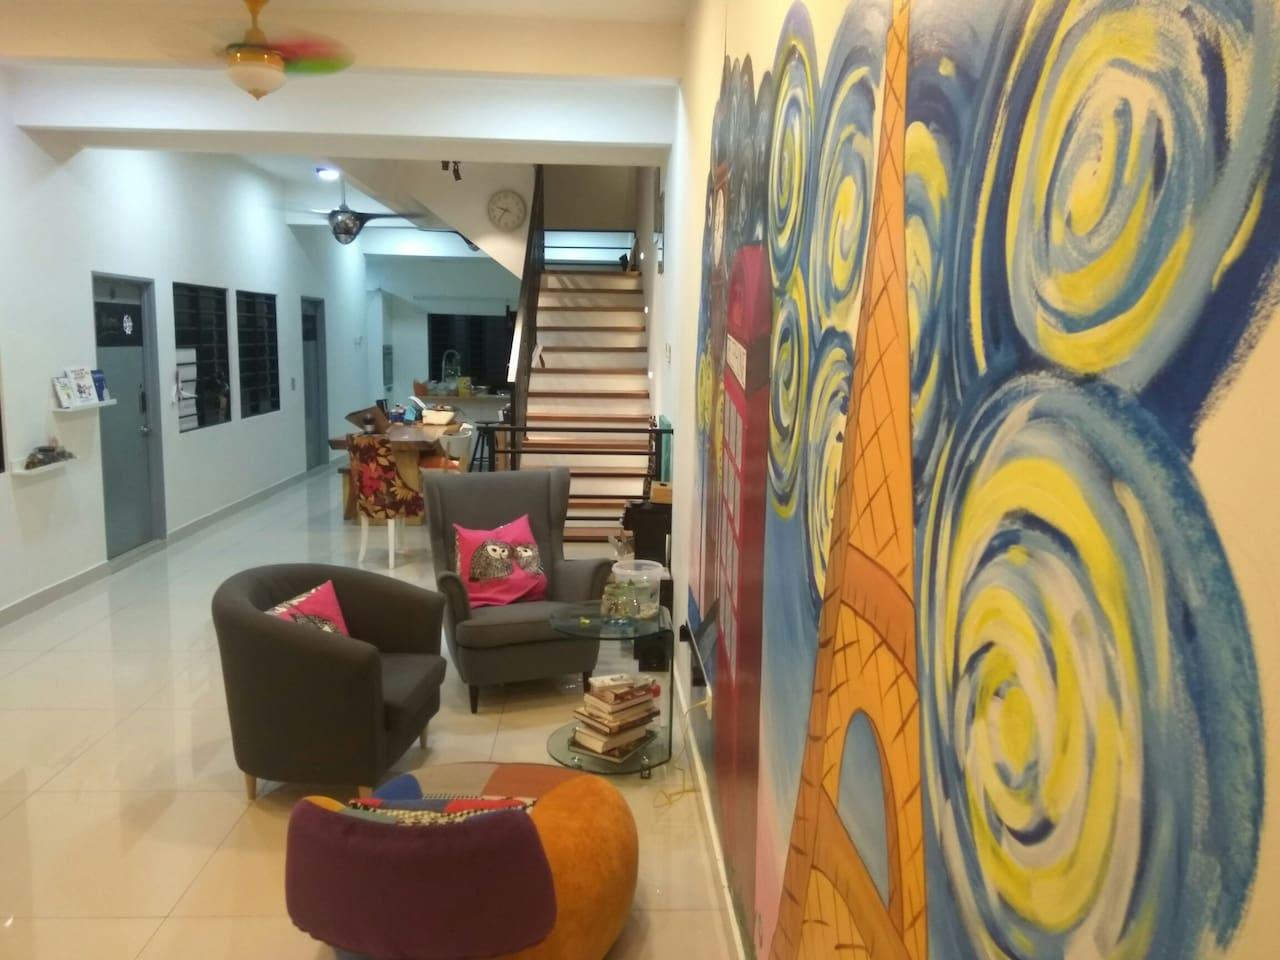 Welcome to B'Studio! Cozy ground floor living area